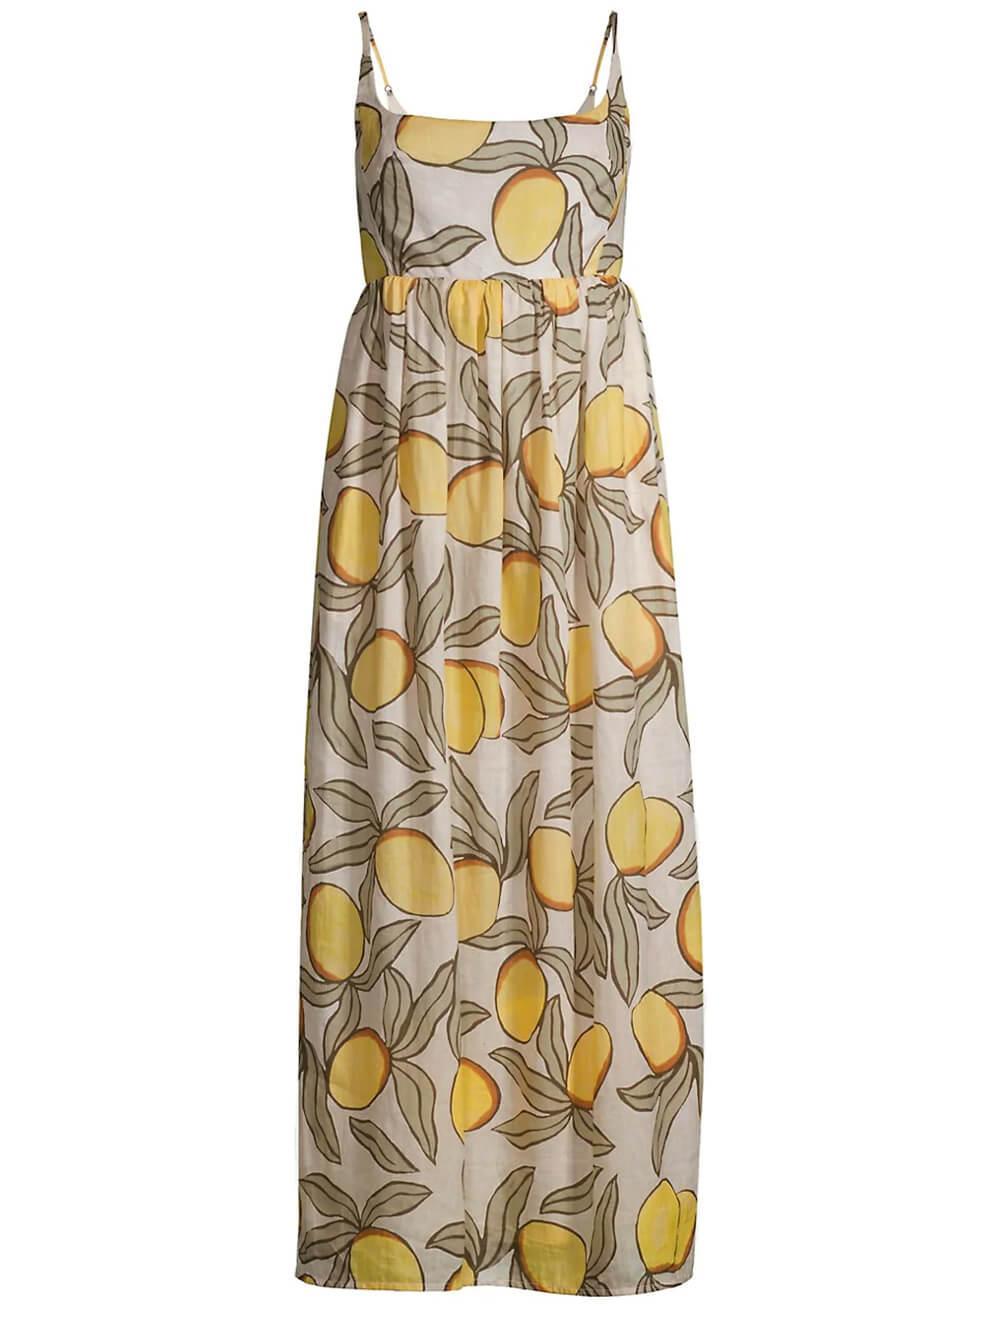 Lemon Tree Puff Waist Dress Item # 521936D860